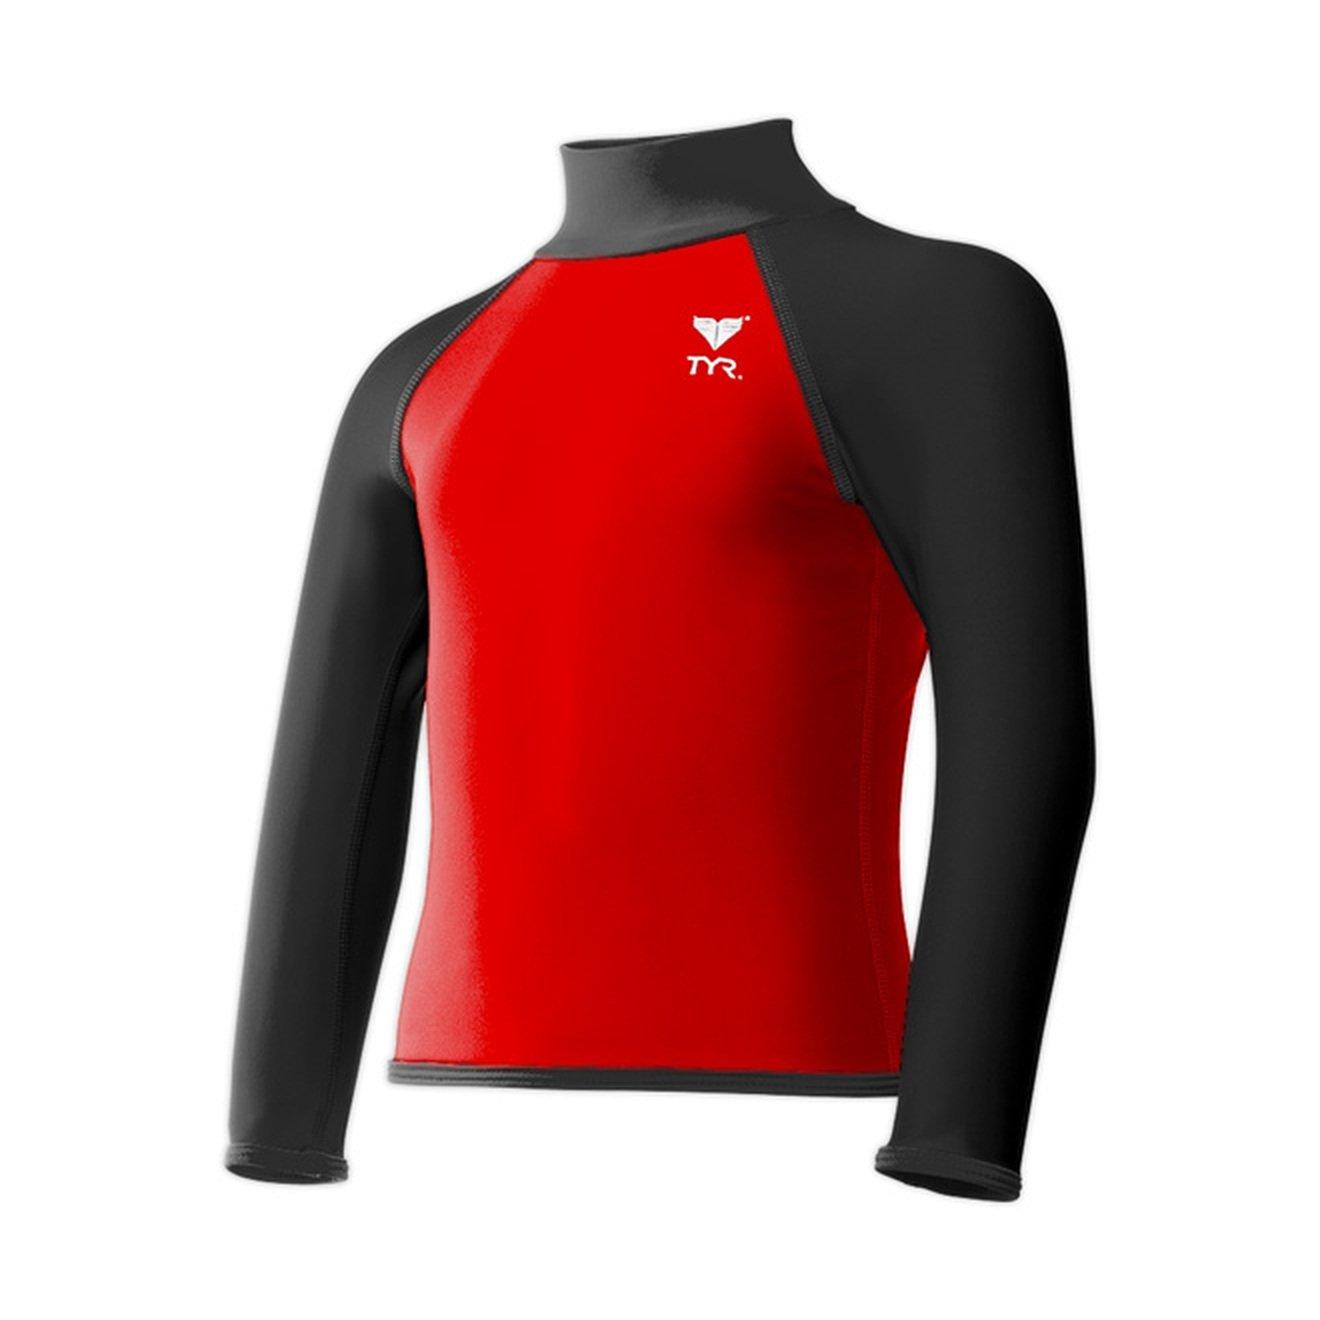 TYR Kids Boys Solid Rashguard Little Kids//Big Kids Red//Black Swimsuit Top